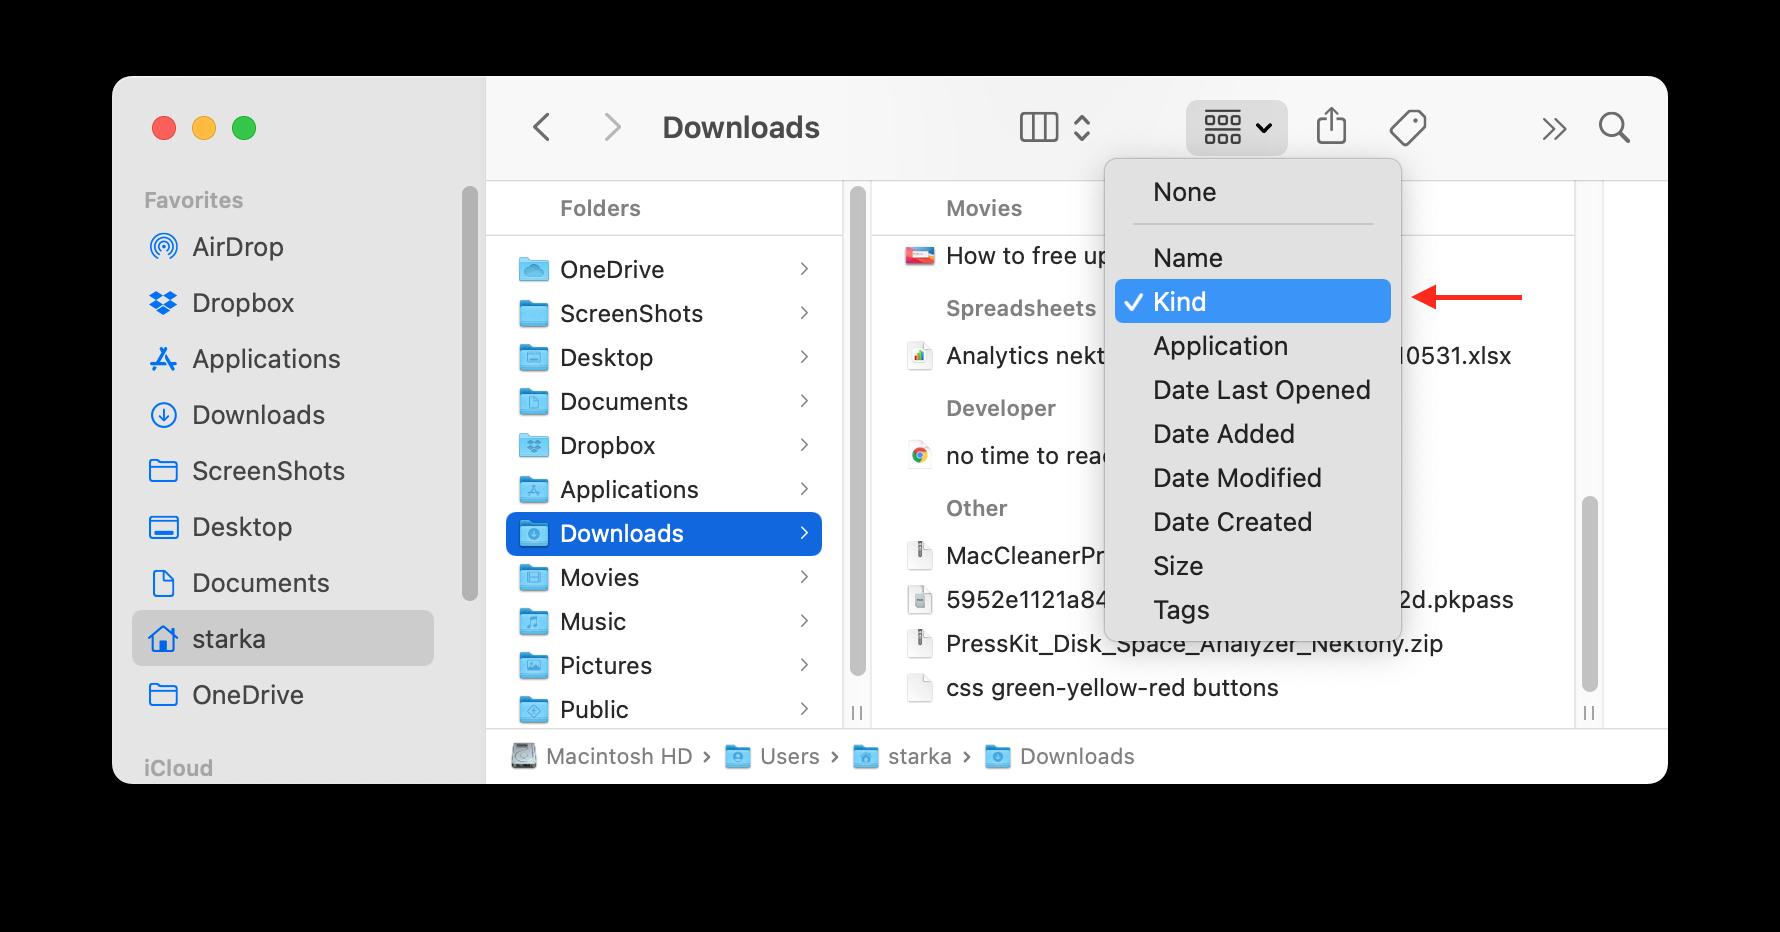 Sorting files in Downloads folder by kind